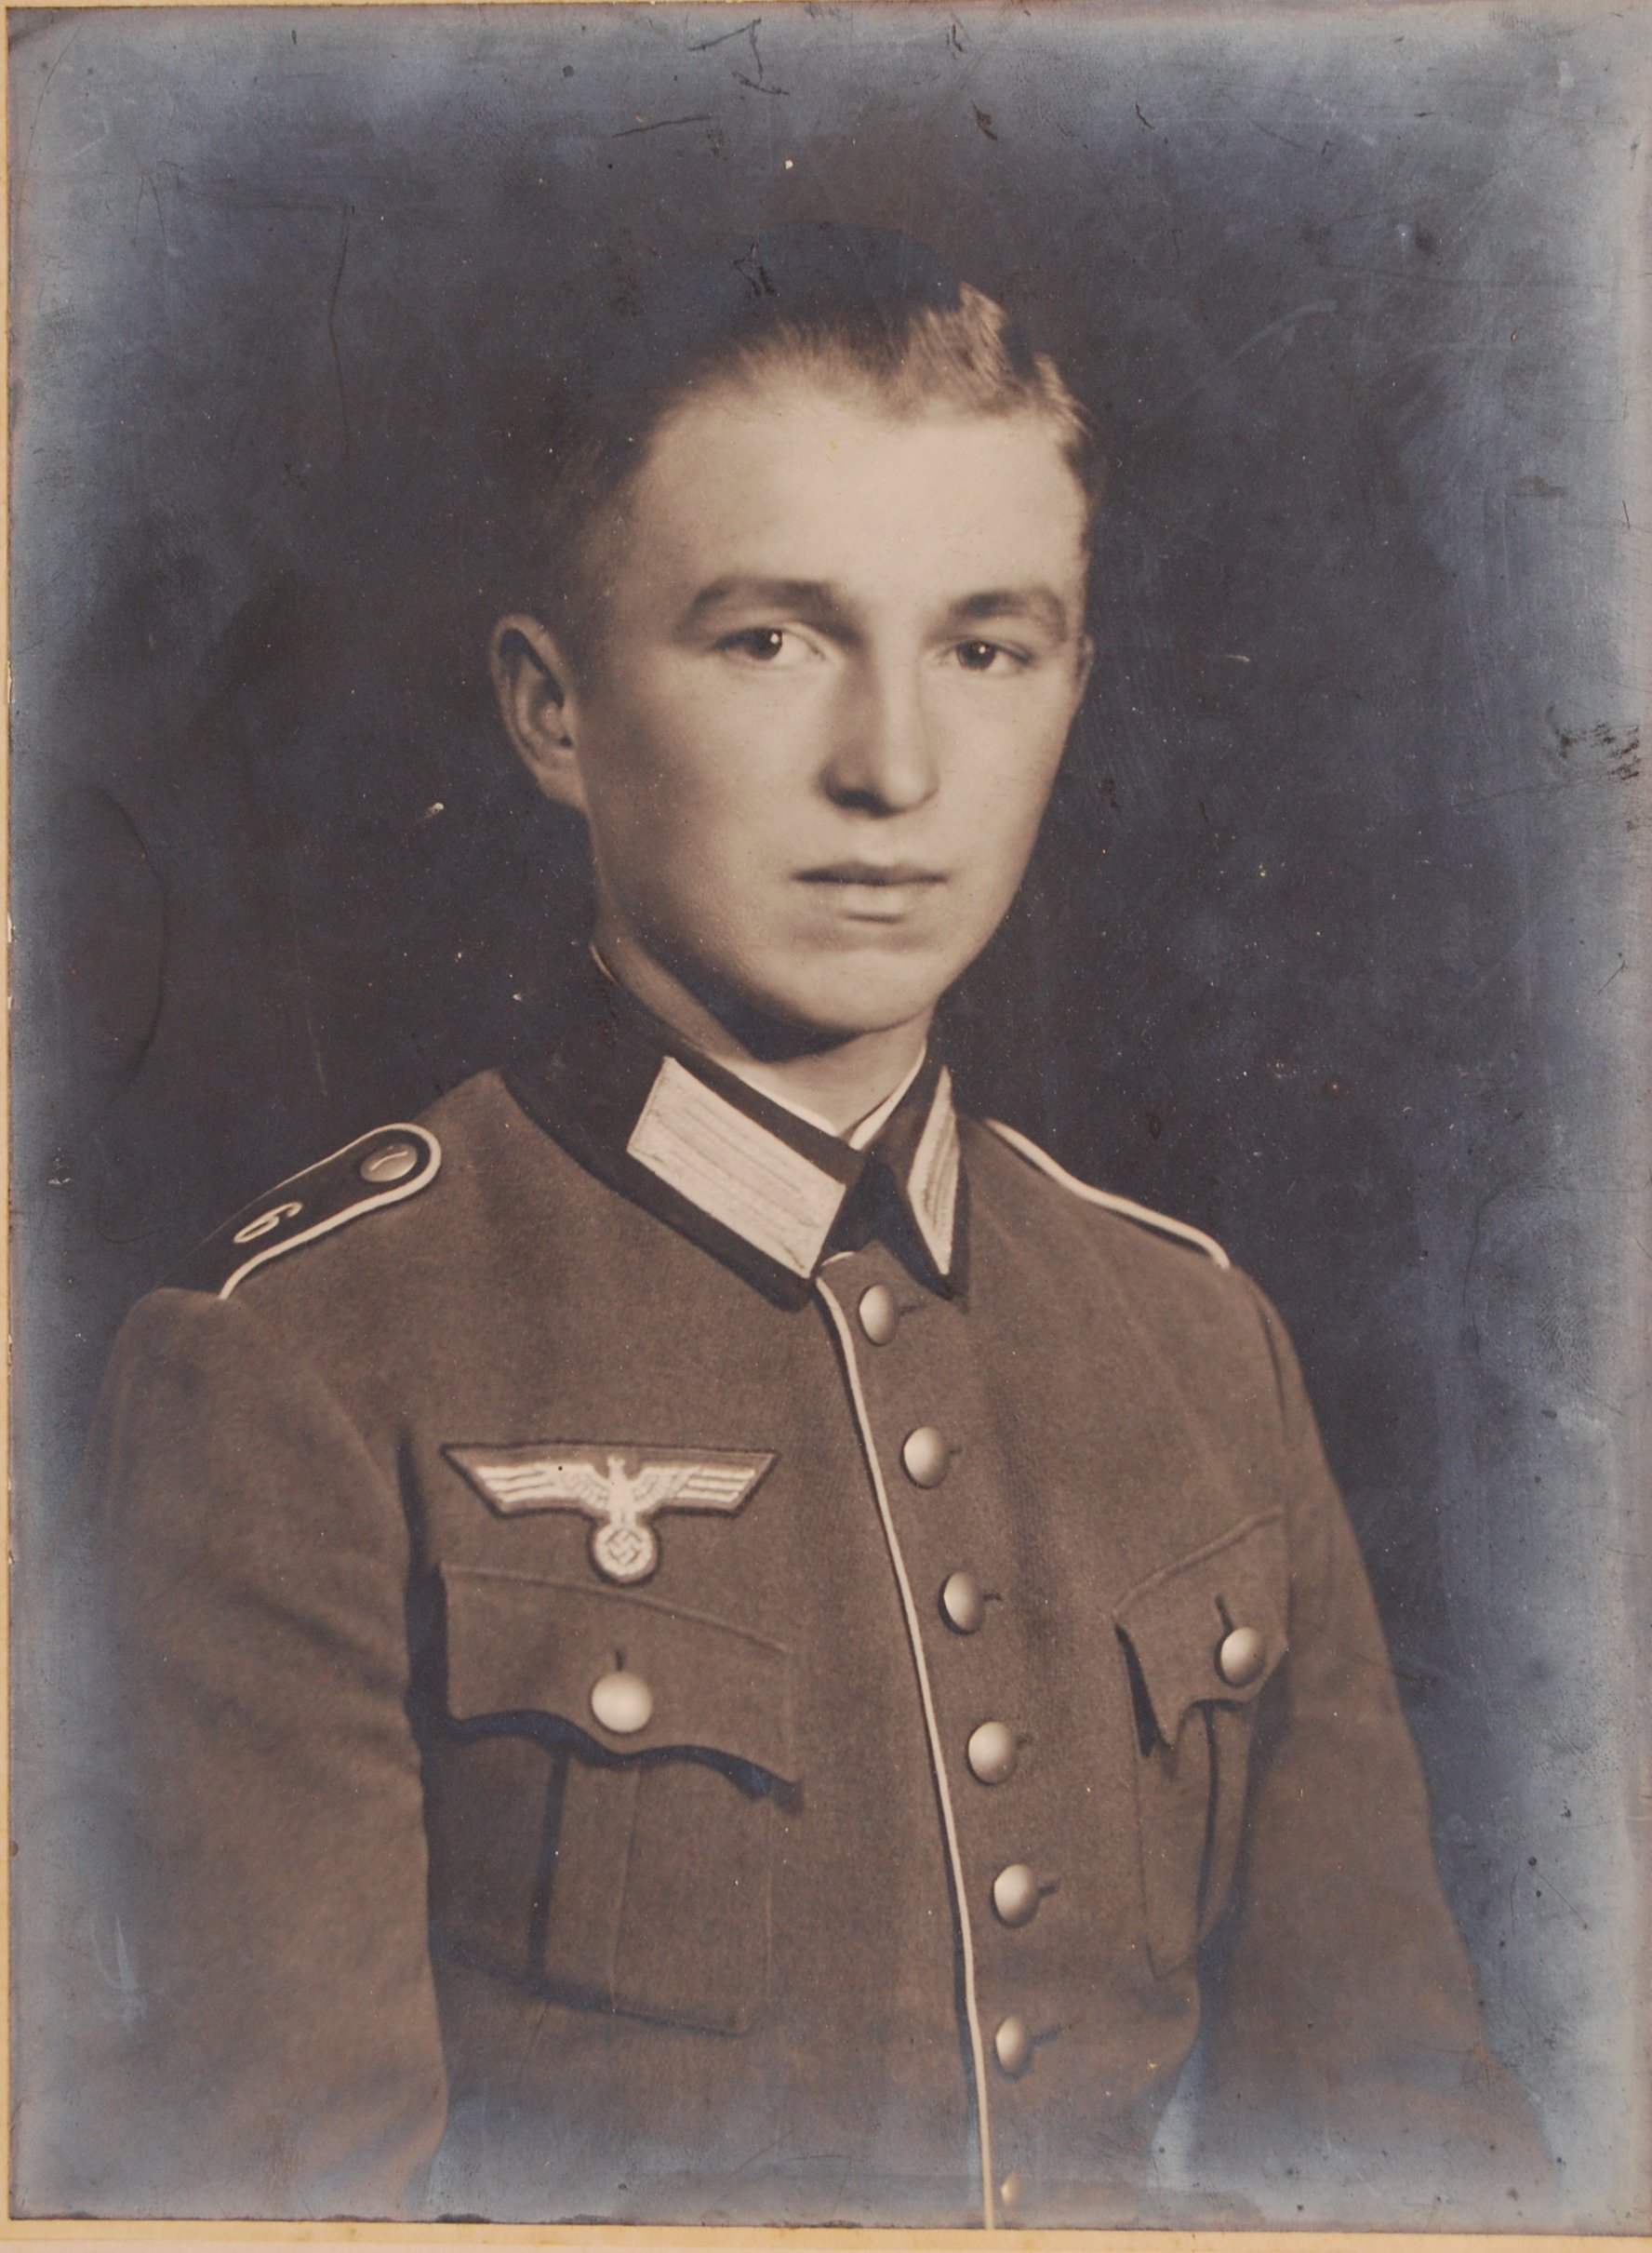 Lot 34 - WWII SECOND WORLD WAR GERMAN NAZI SOLDIER FRAMED P